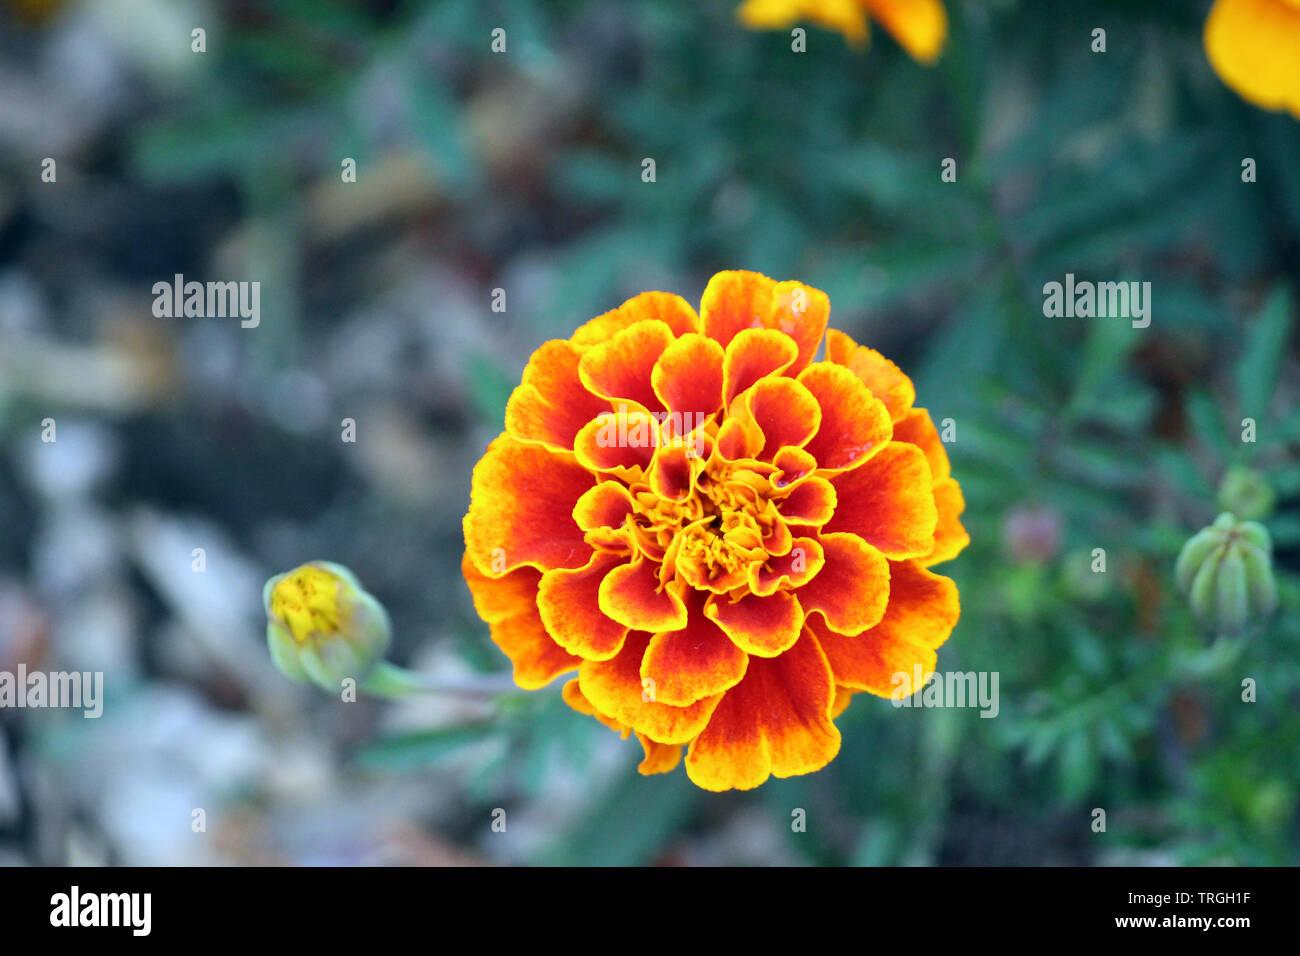 Macro shot of a Marigold flower in full bloom using a bokeh effect